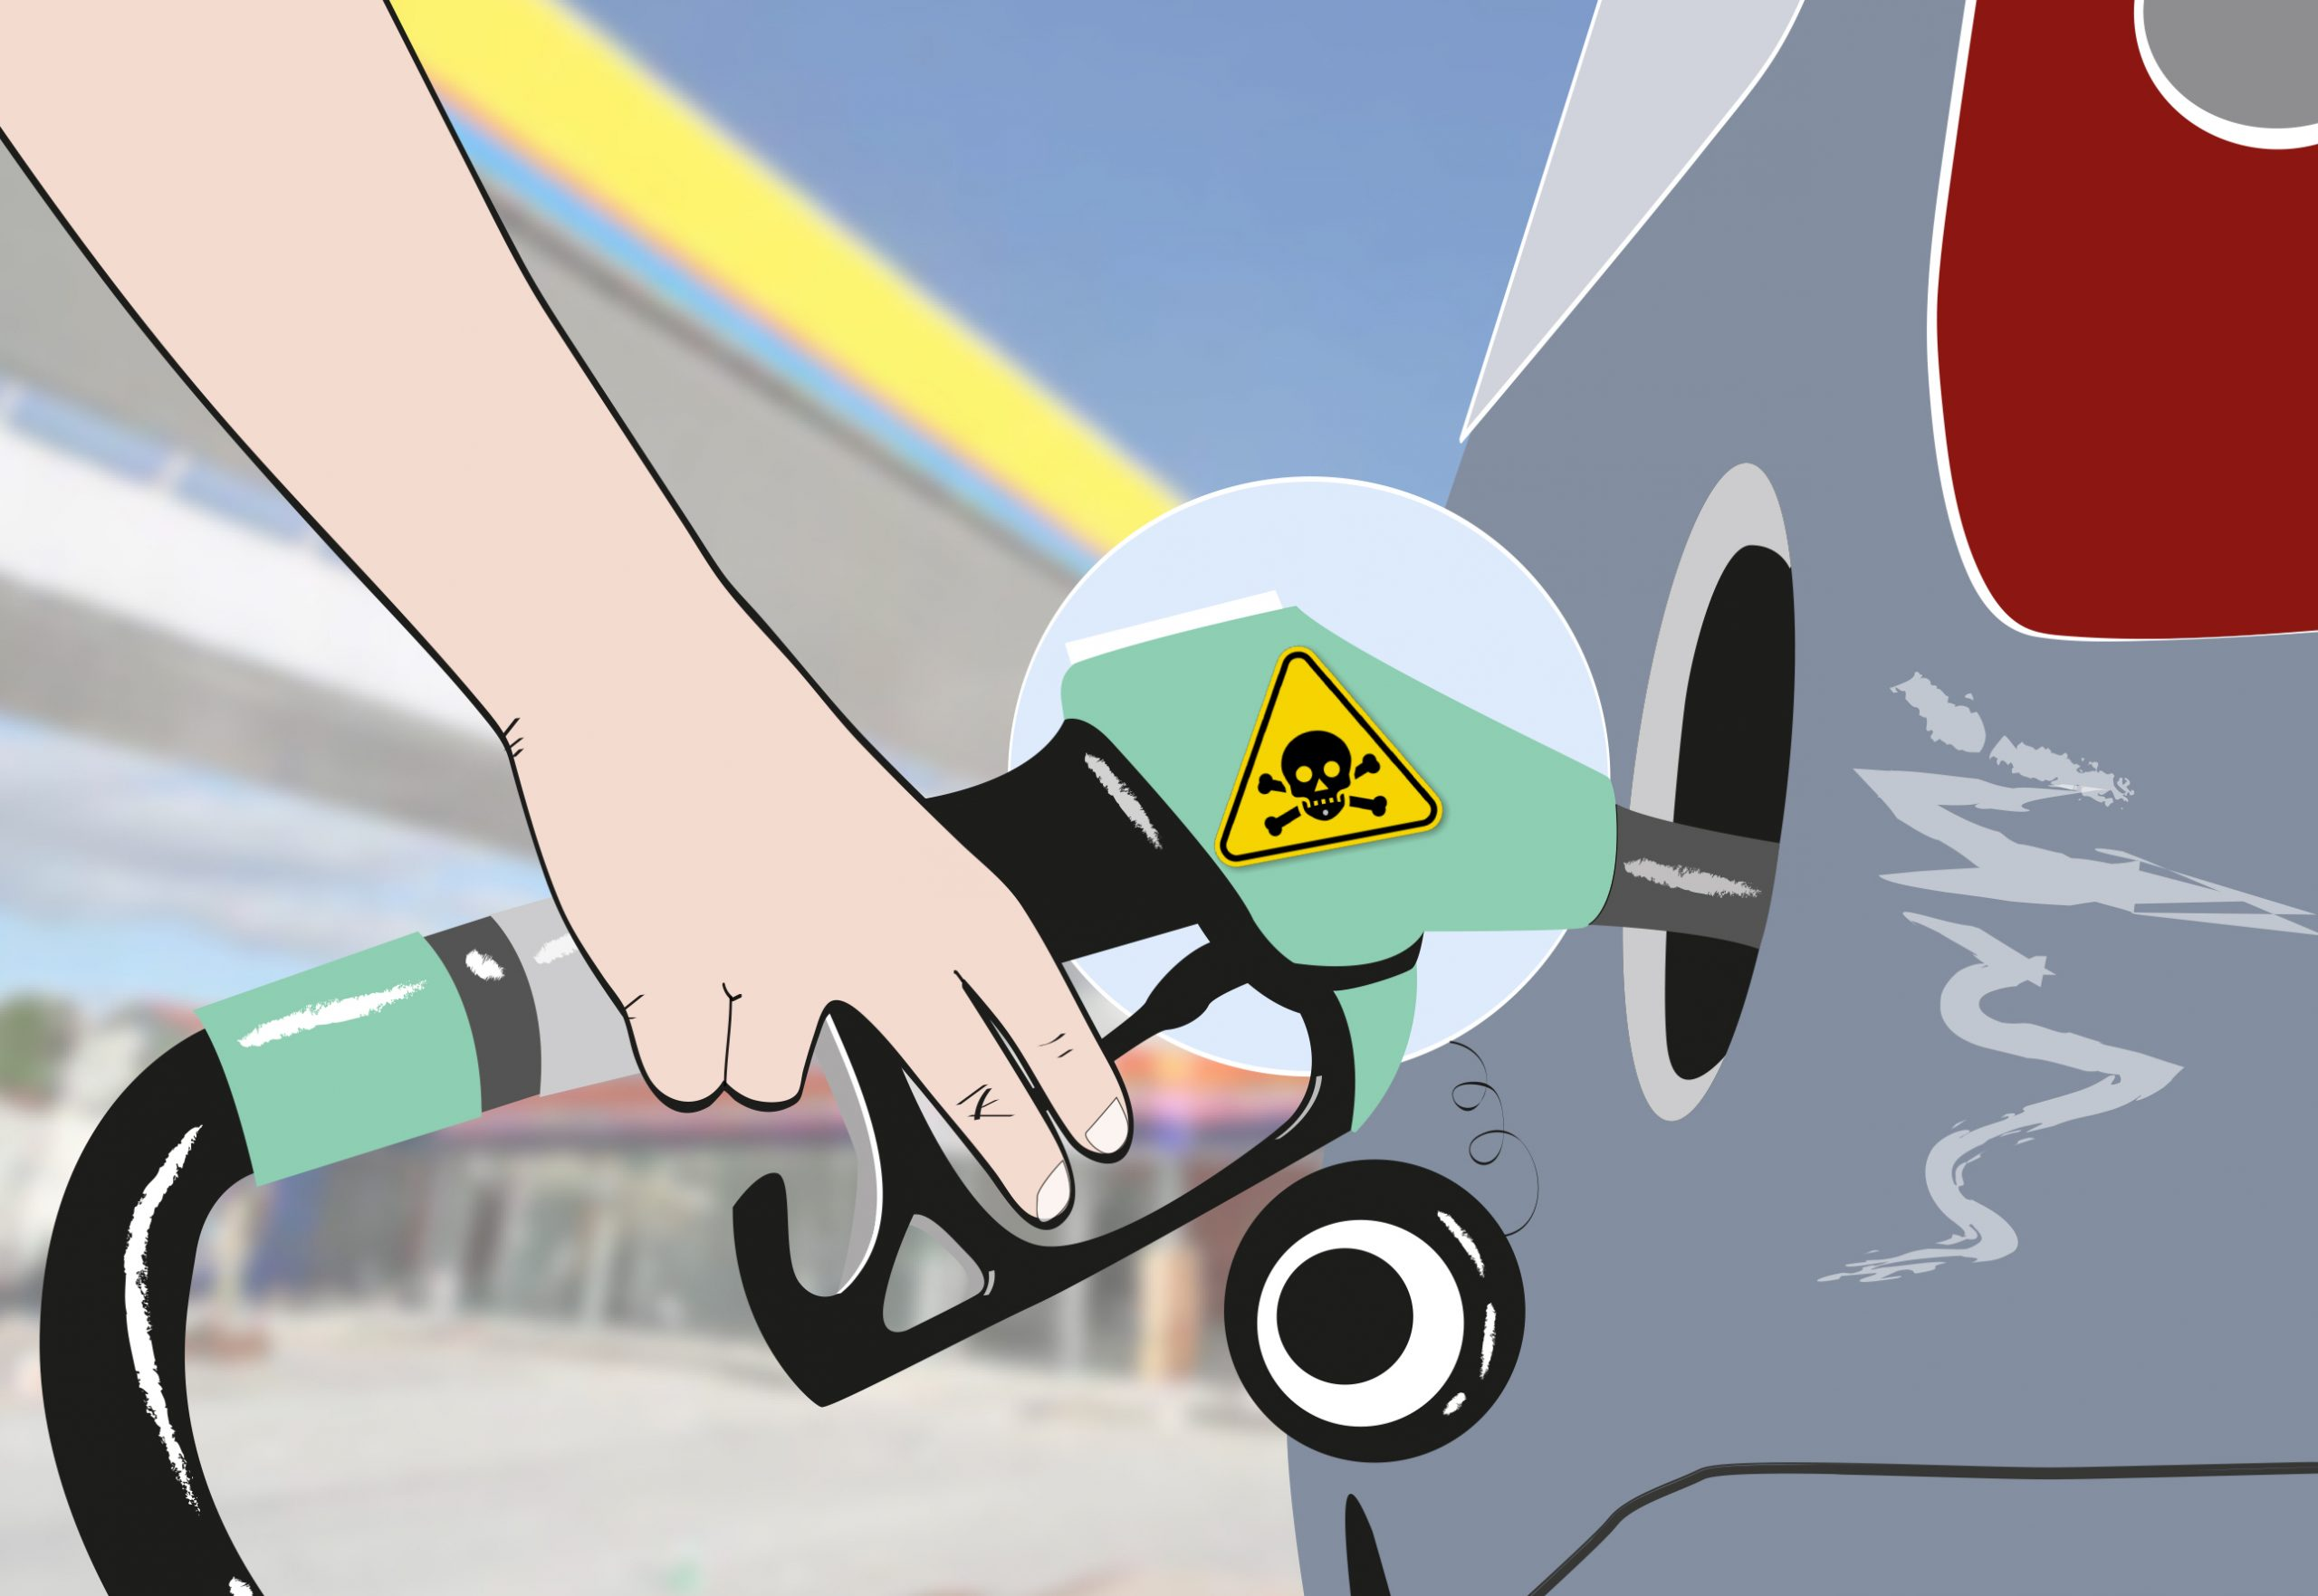 ilustra postos gasolina adulterada